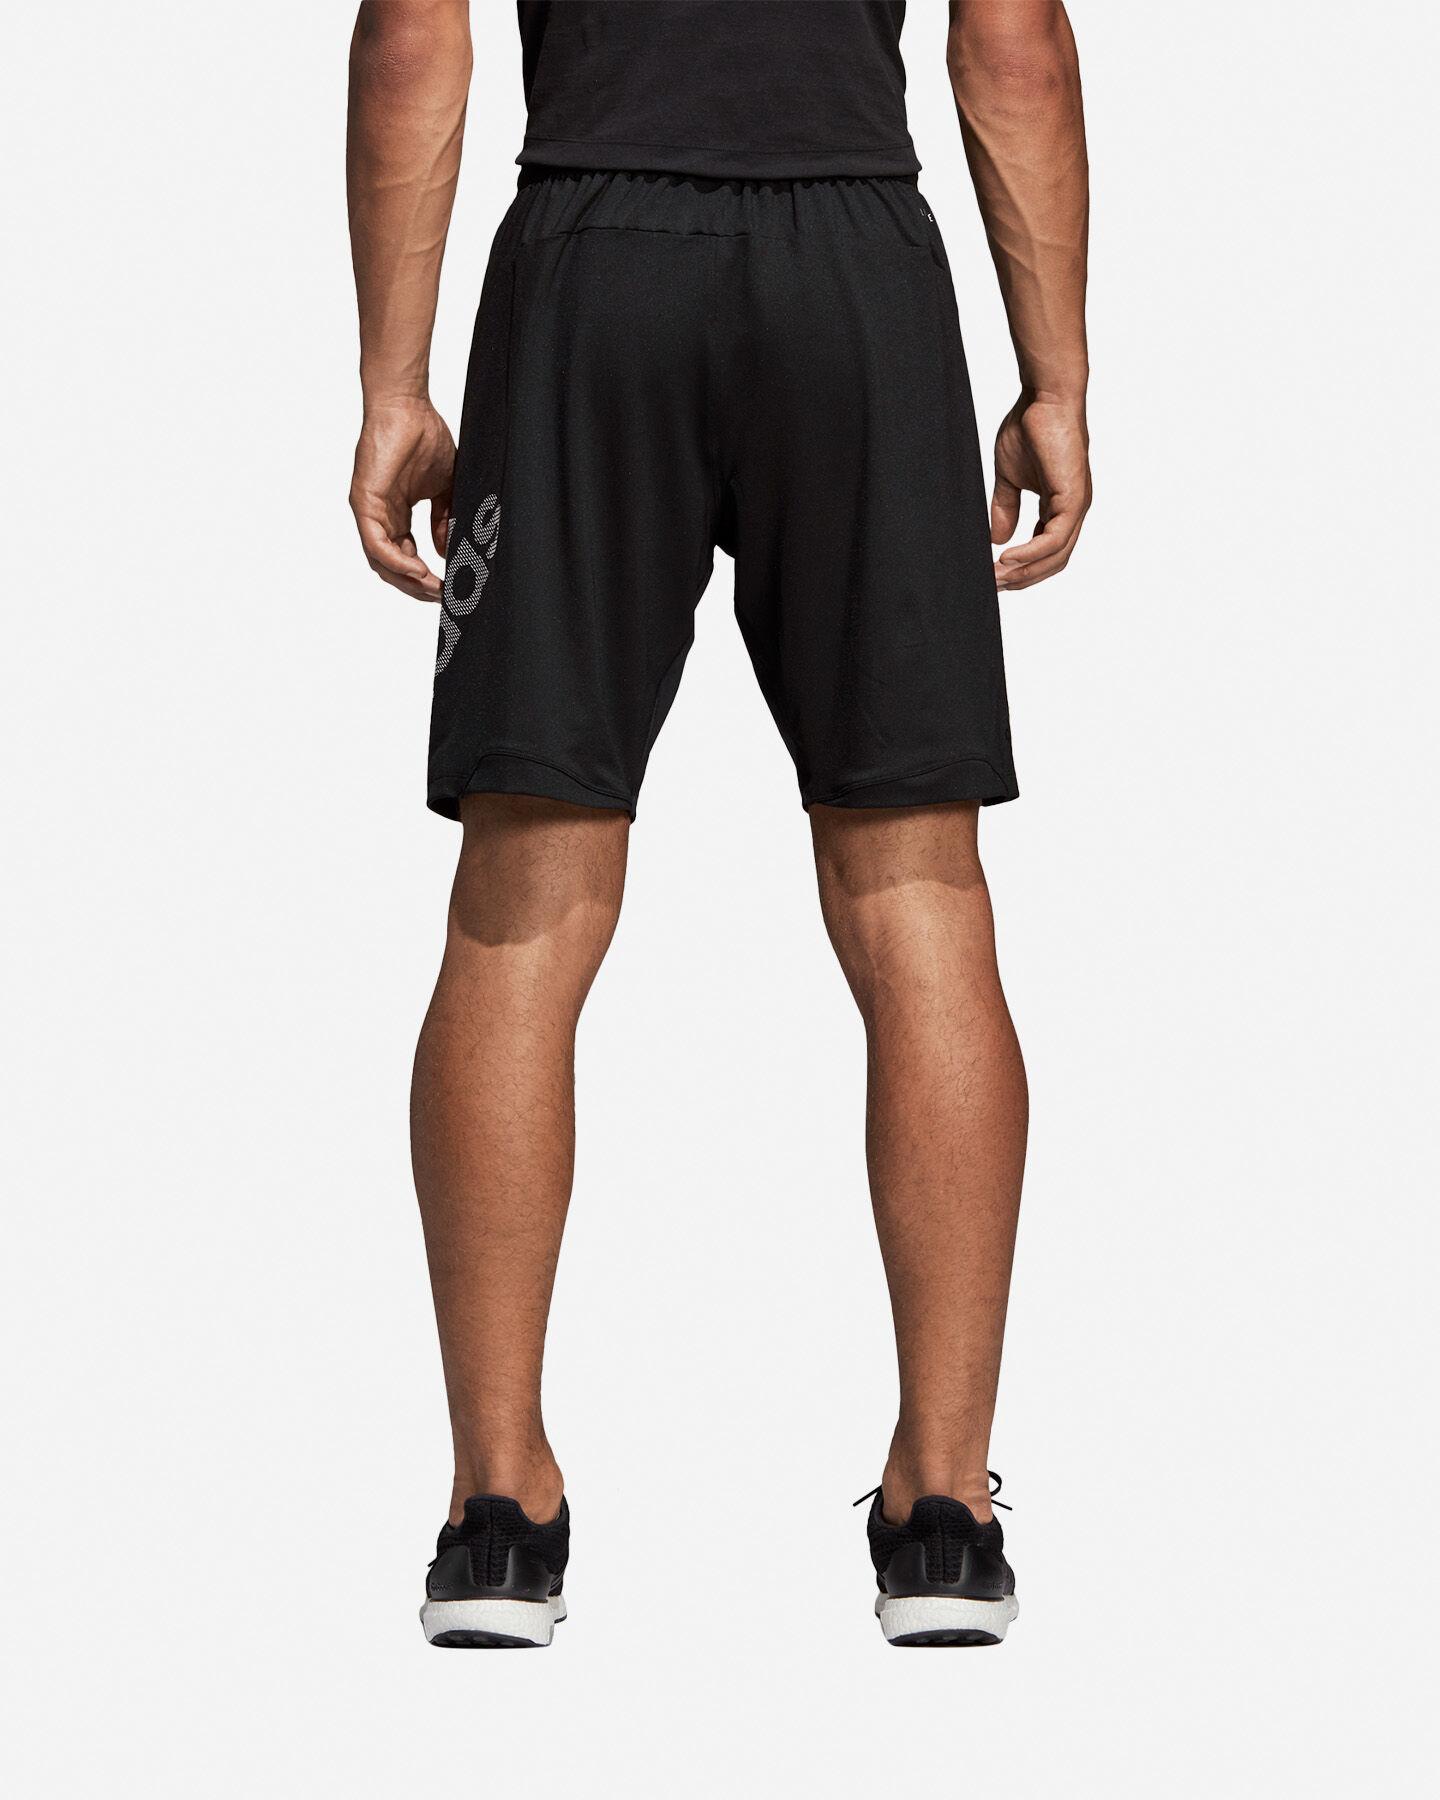 Pantalone training ADIDAS 4KRFT SPORT GRAPHIC BADGE OF SPORT M S2020483 scatto 4